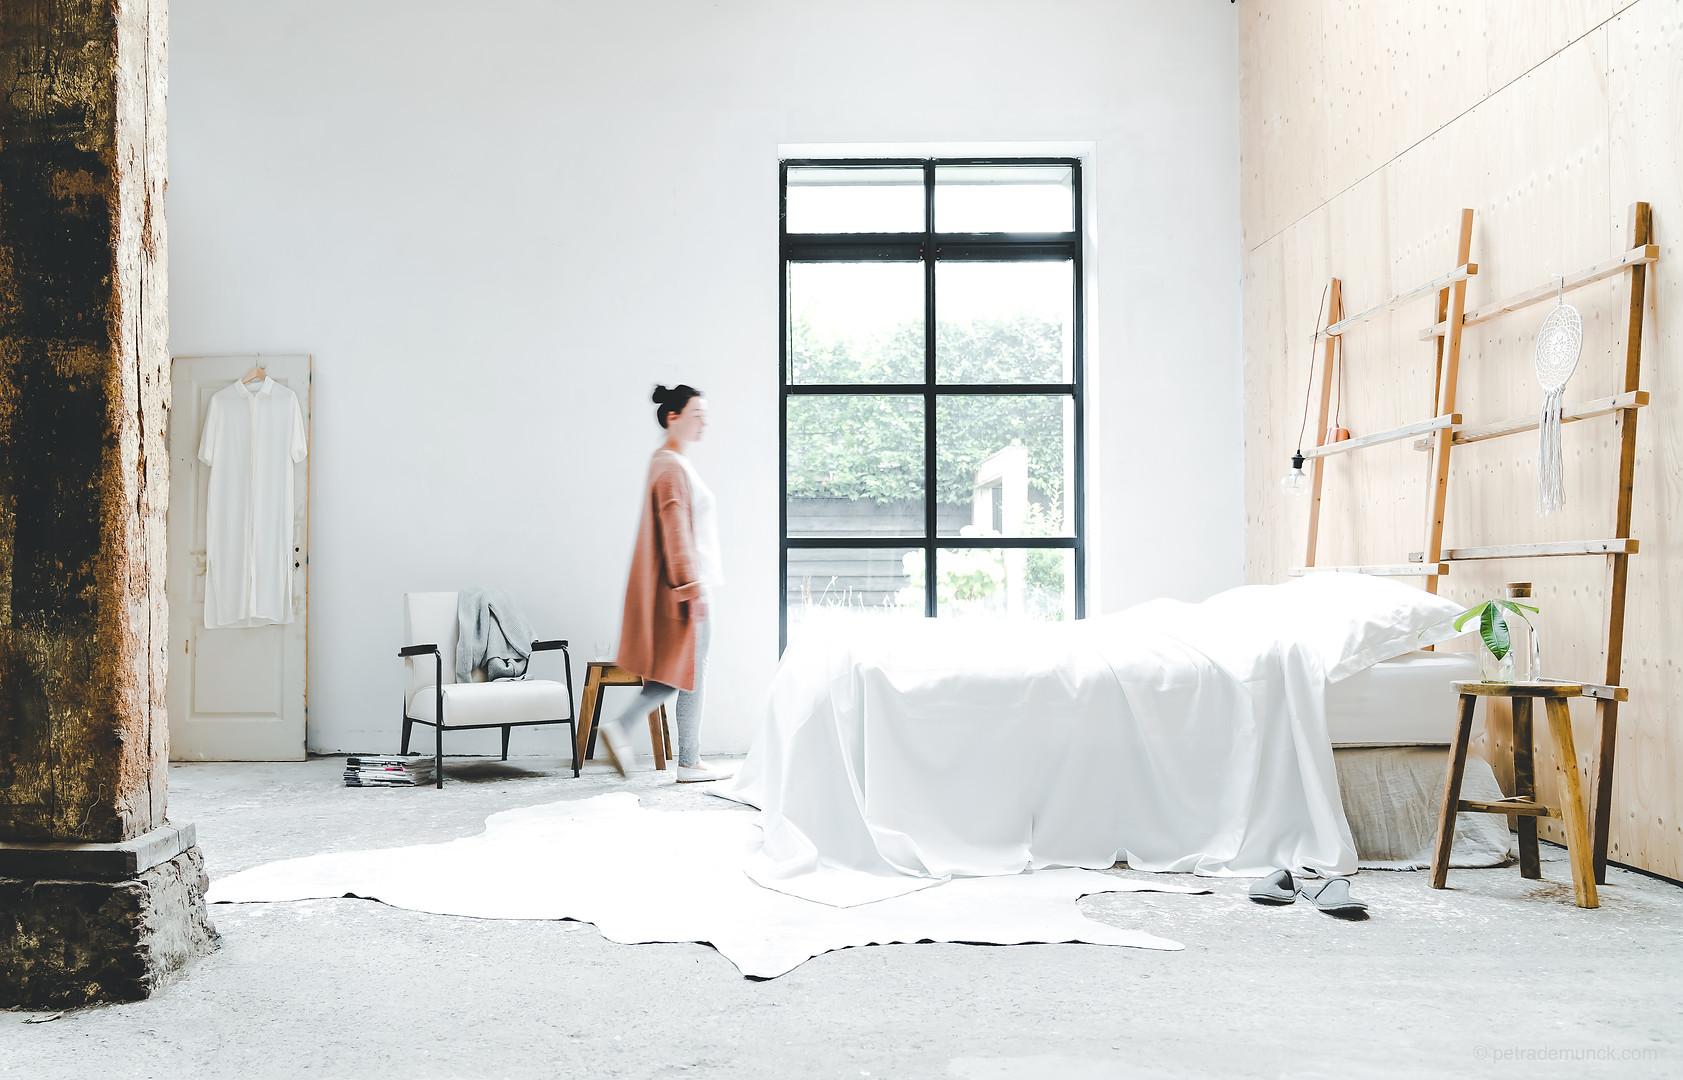 180829-Bed&Bath-0073-kf-kf_KOTERFOTO-pet